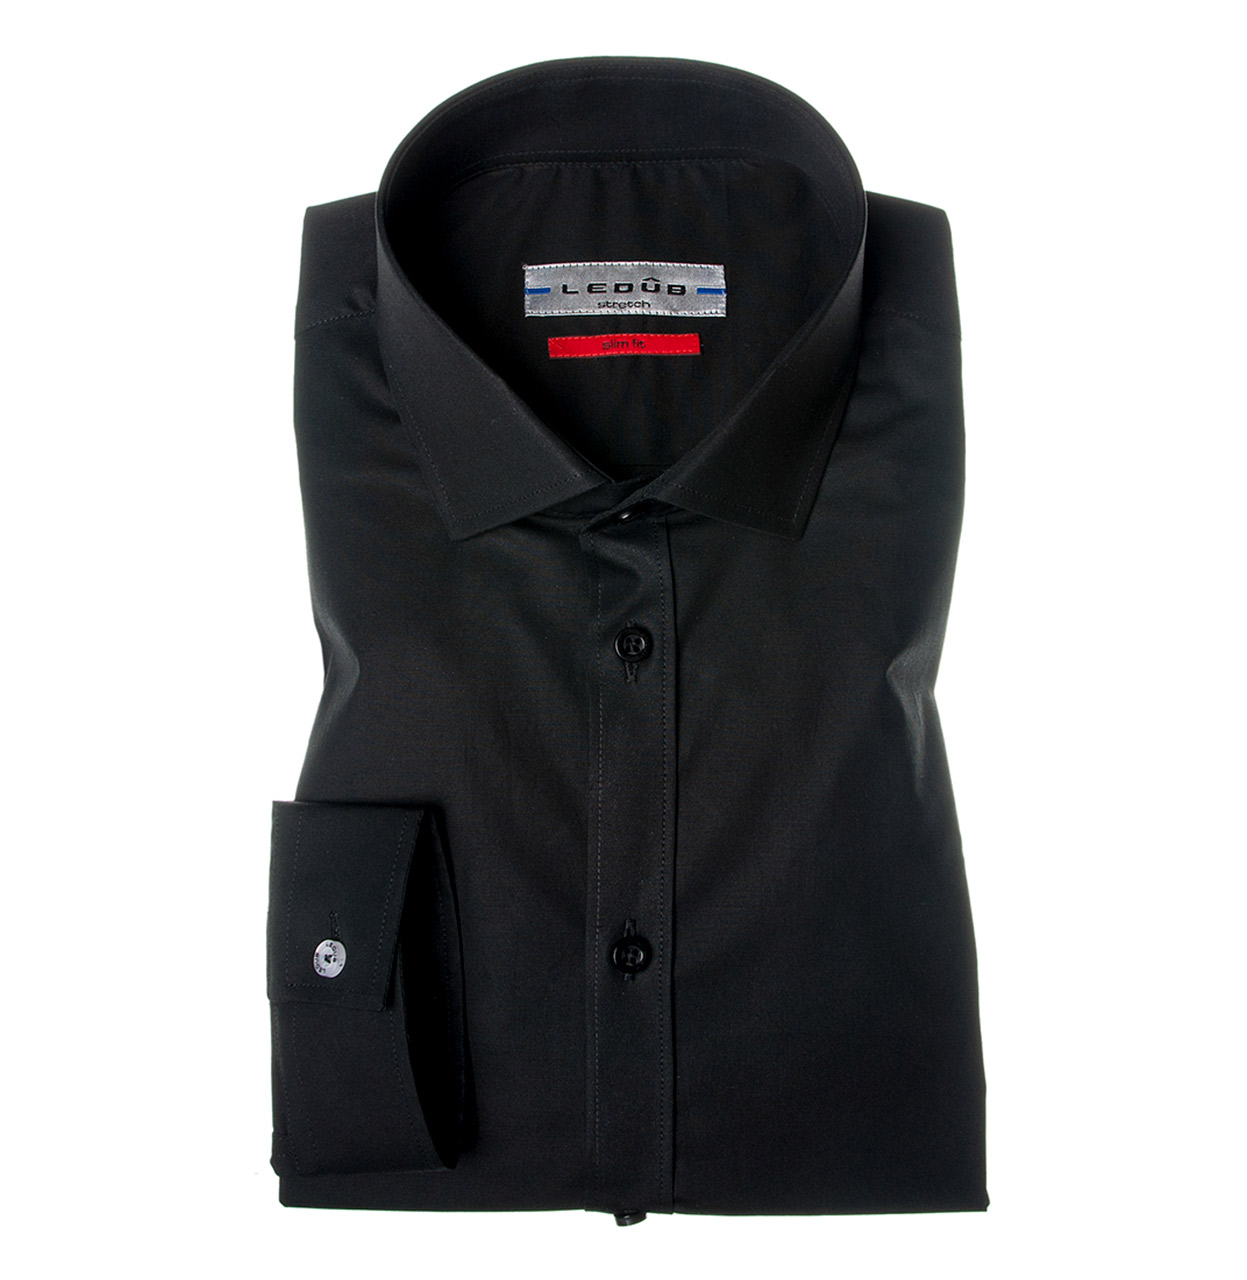 Ledub Shirt 0042510 290000 Zwart 290 0042510 zwart Maat 41